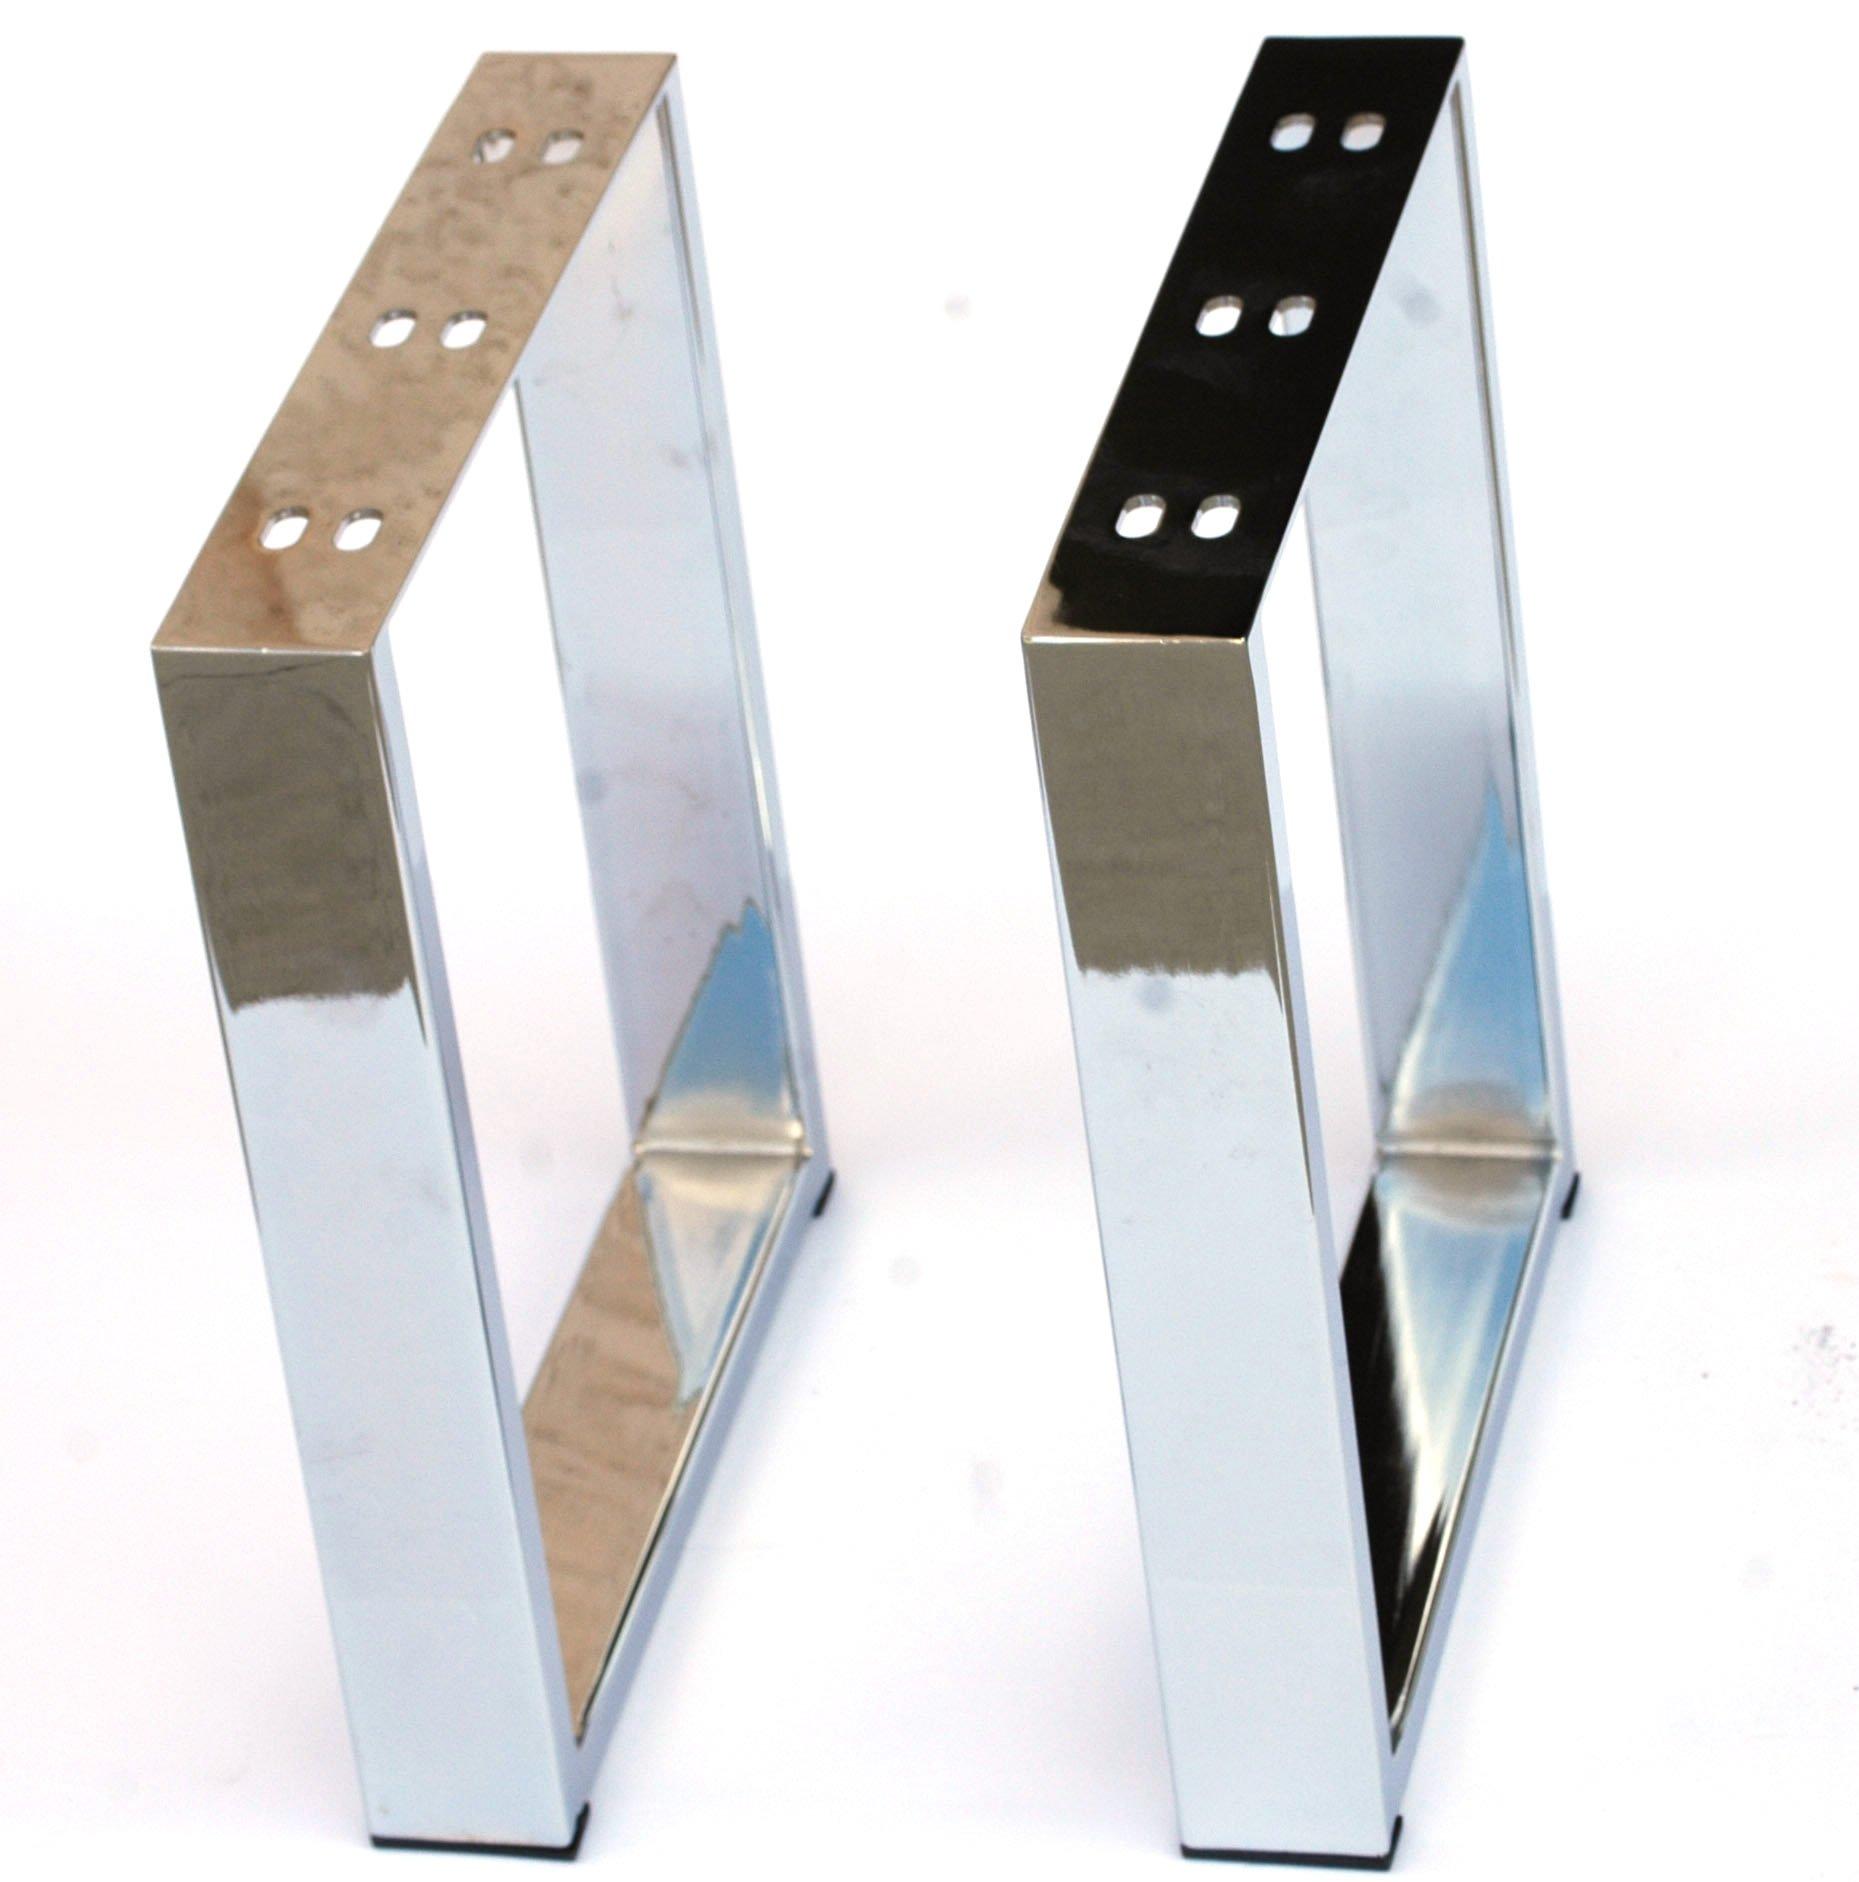 Alpha Furnishings Heavy Duty Chrome Table Leg, X Metal Legs for Coffee Table, Bench, DIY Affordable! 2PC